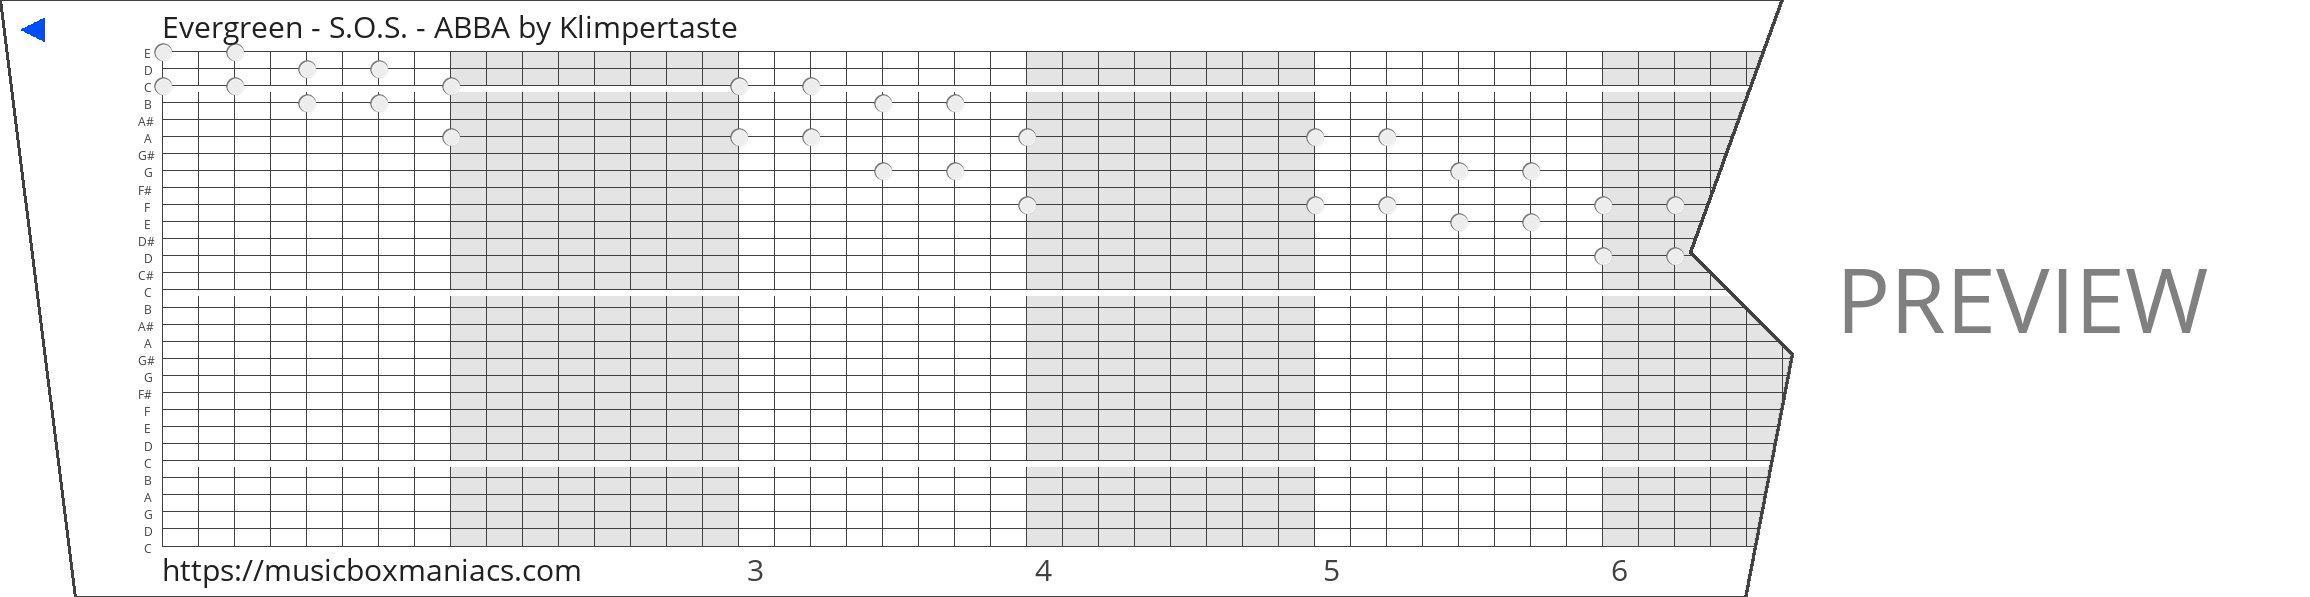 Evergreen - S.O.S. - ABBA 30 note music box paper strip